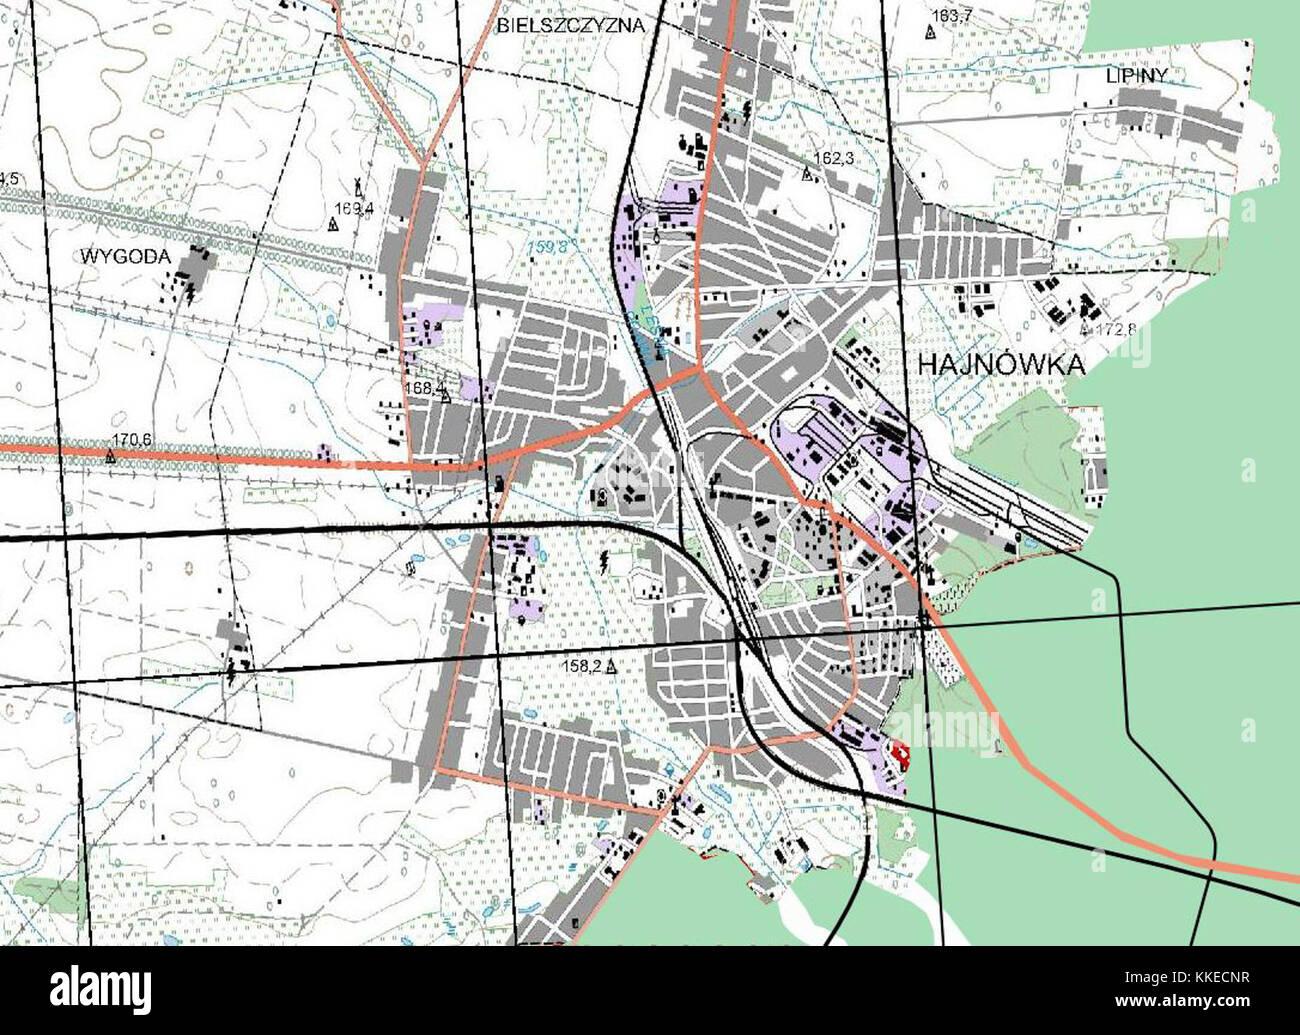 Hajnowka-plan-PLC50k - Stock Image